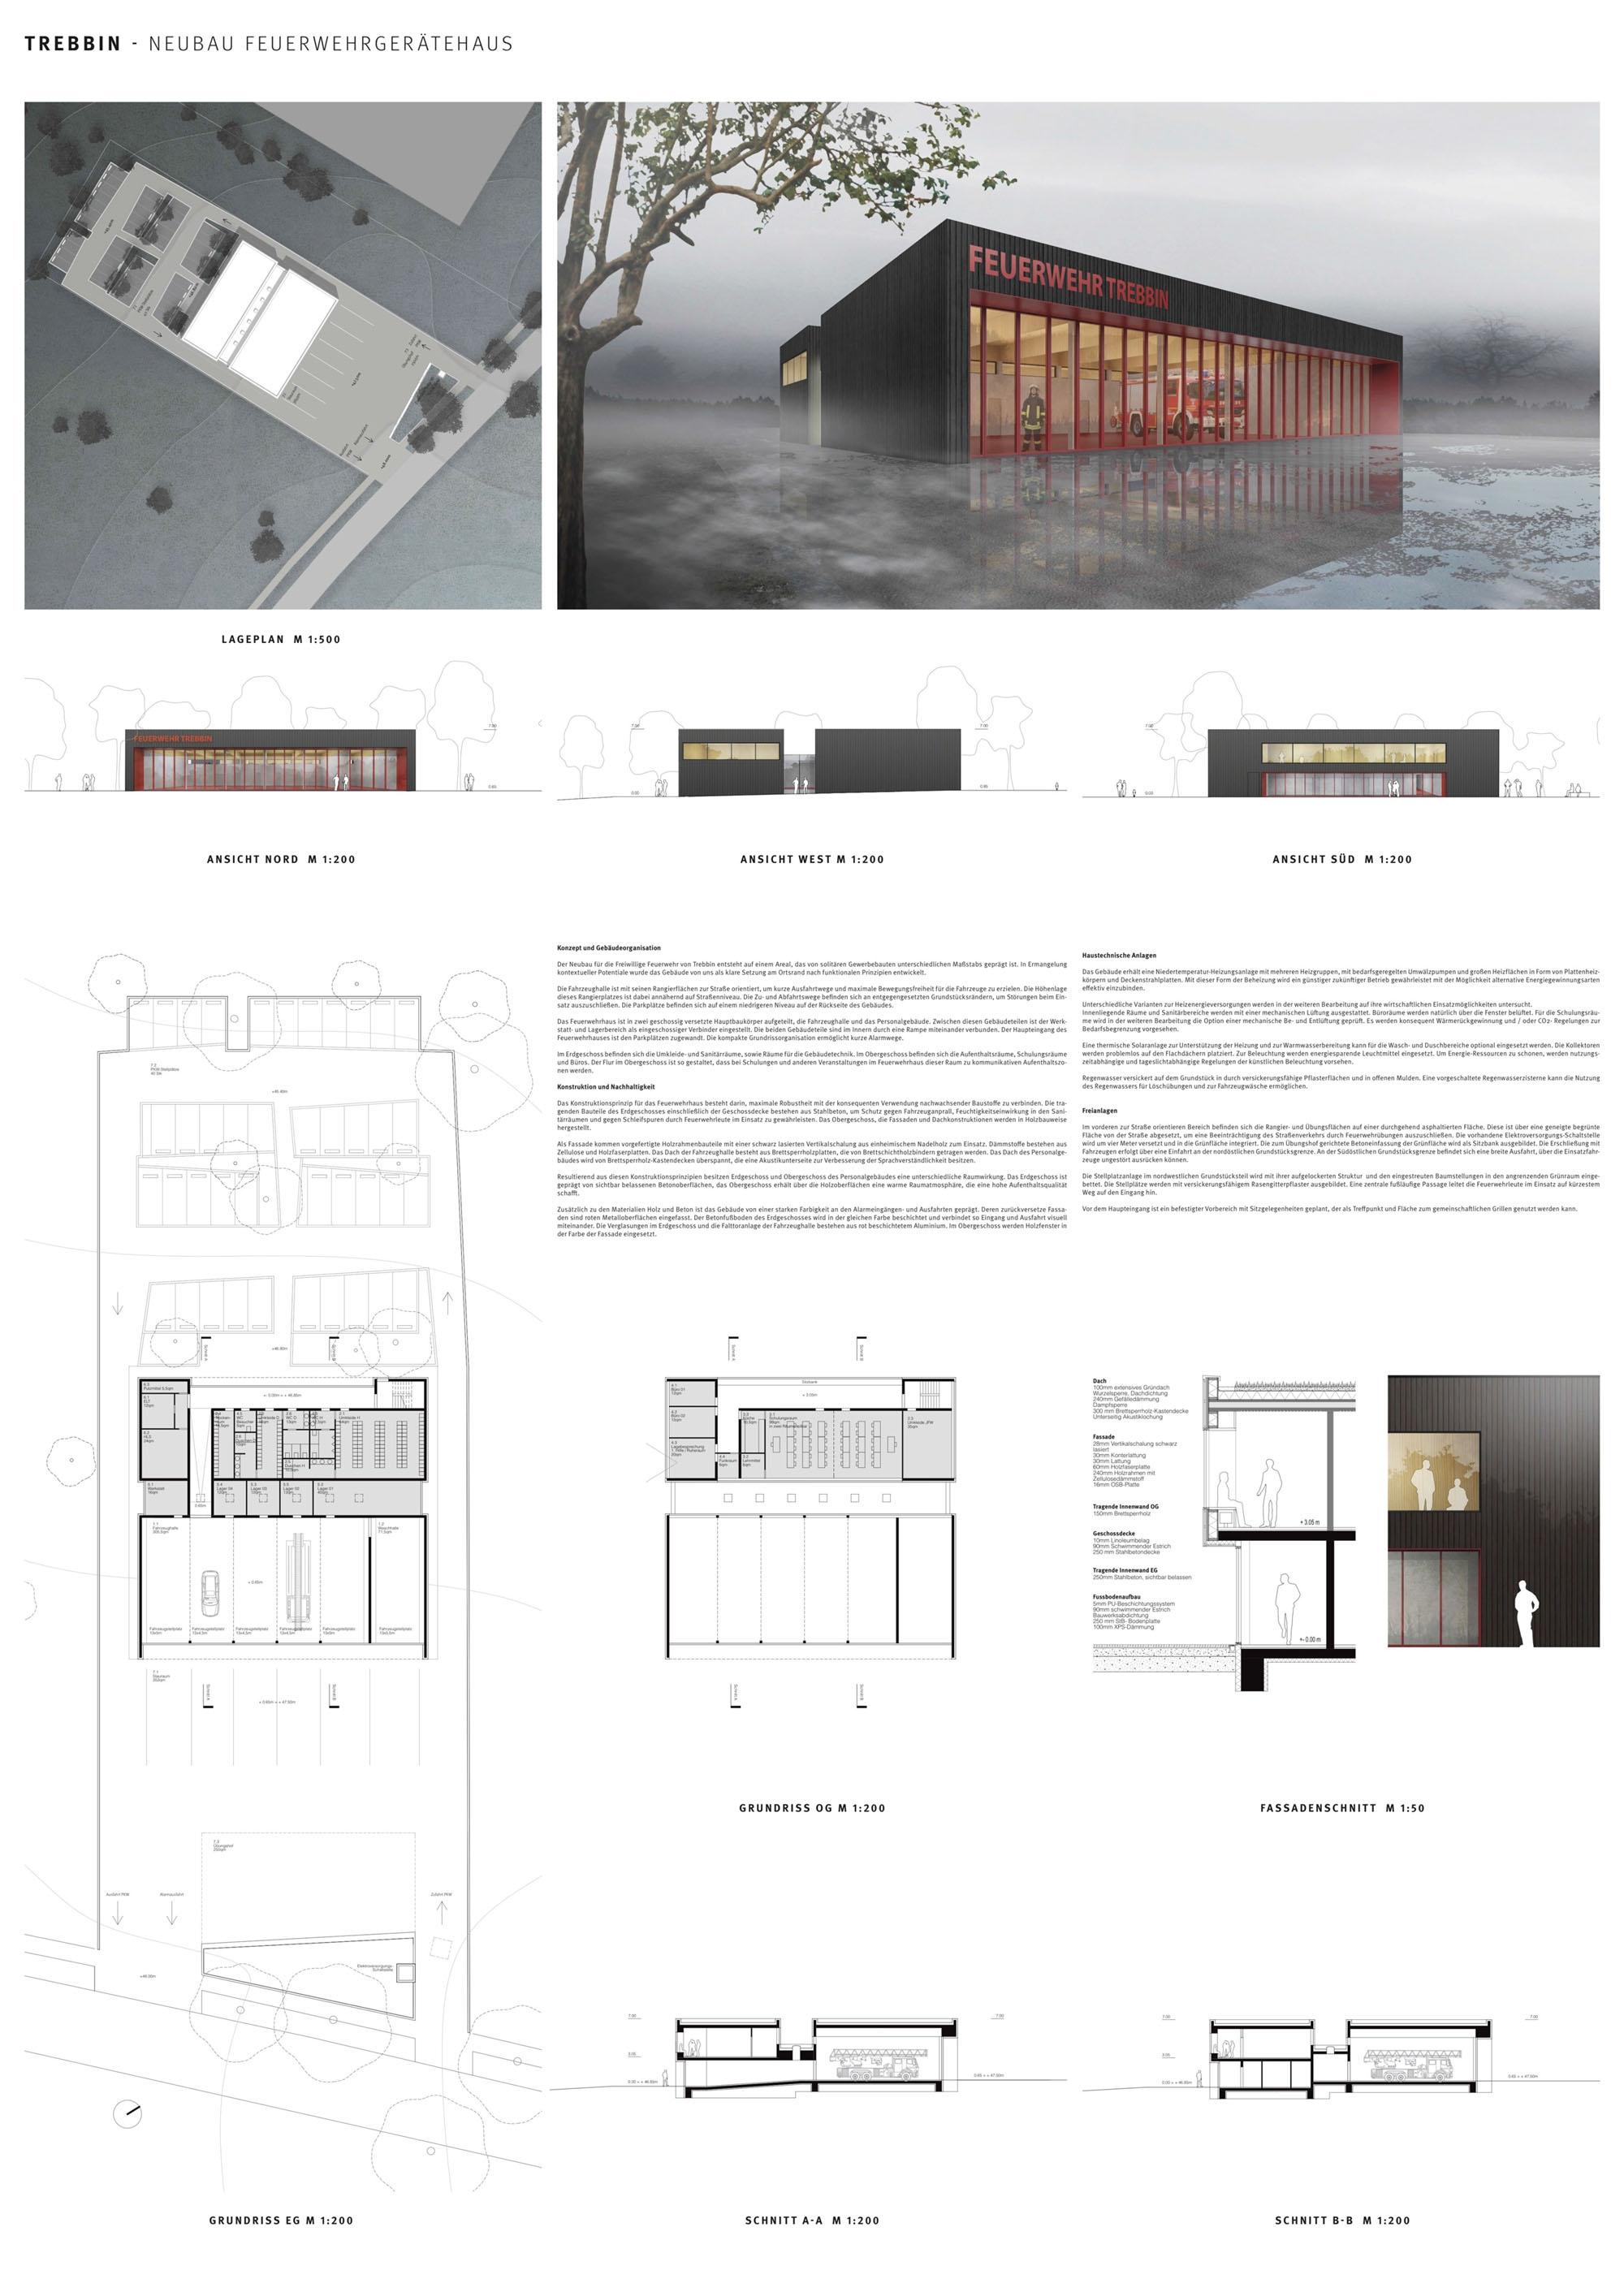 Result Neubau Feuerwehrgeratehaus Competitionline